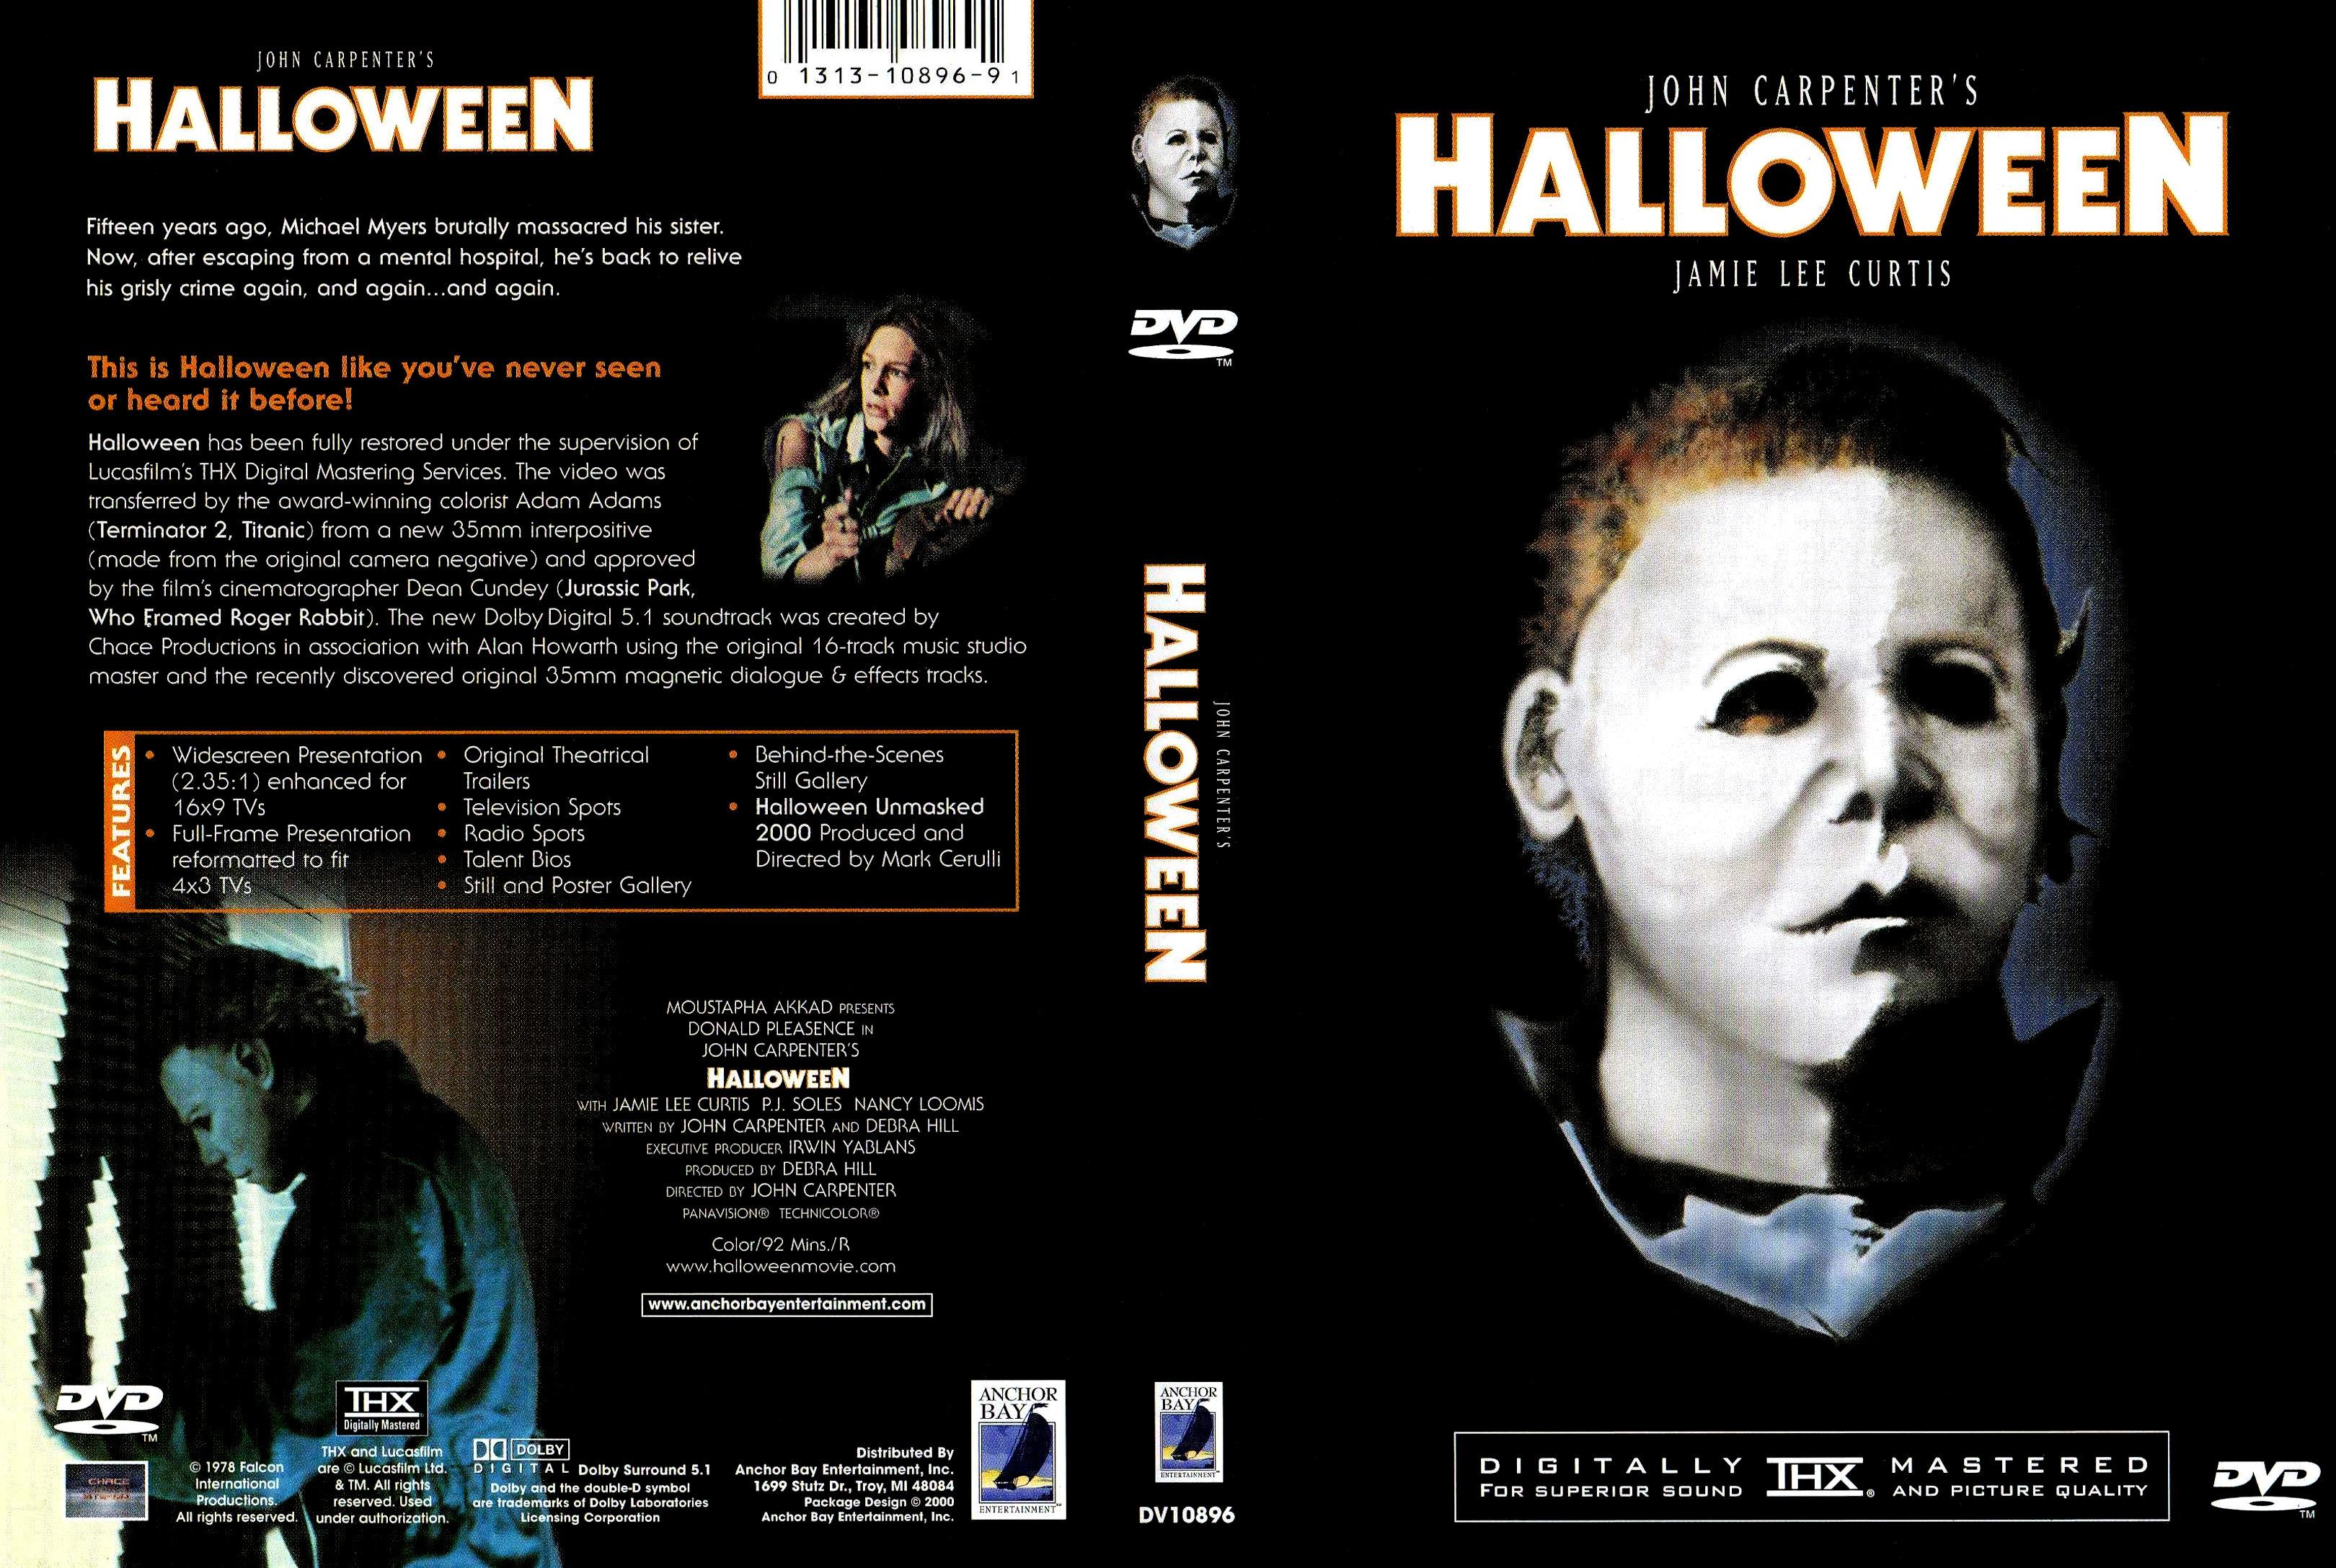 halloween unmasked 2000 video 1999 imdb